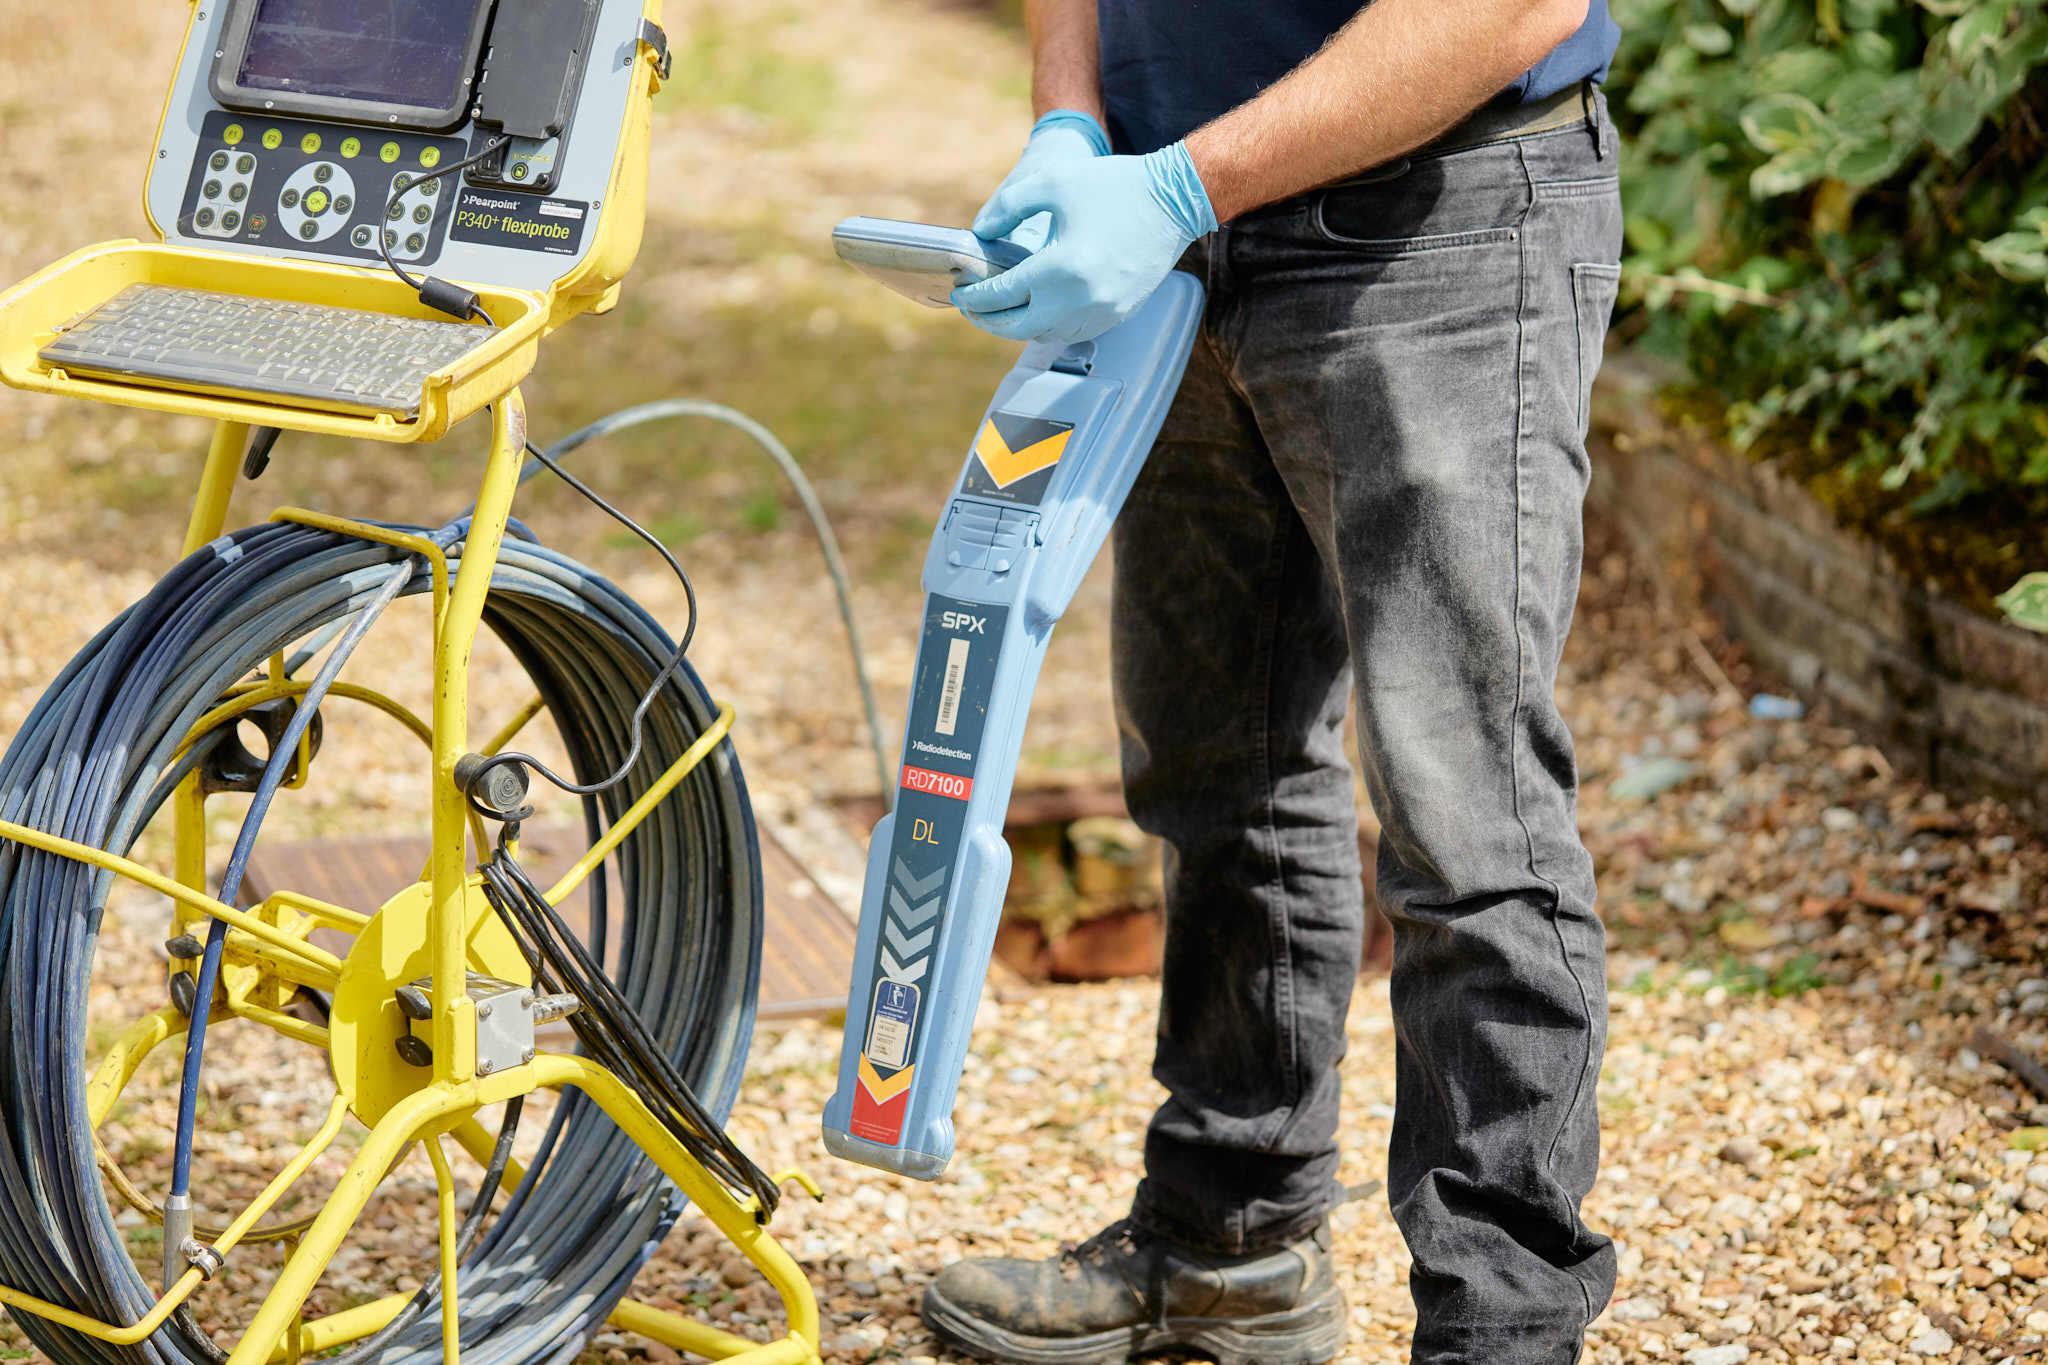 UKDP team with drainage surveying equipment